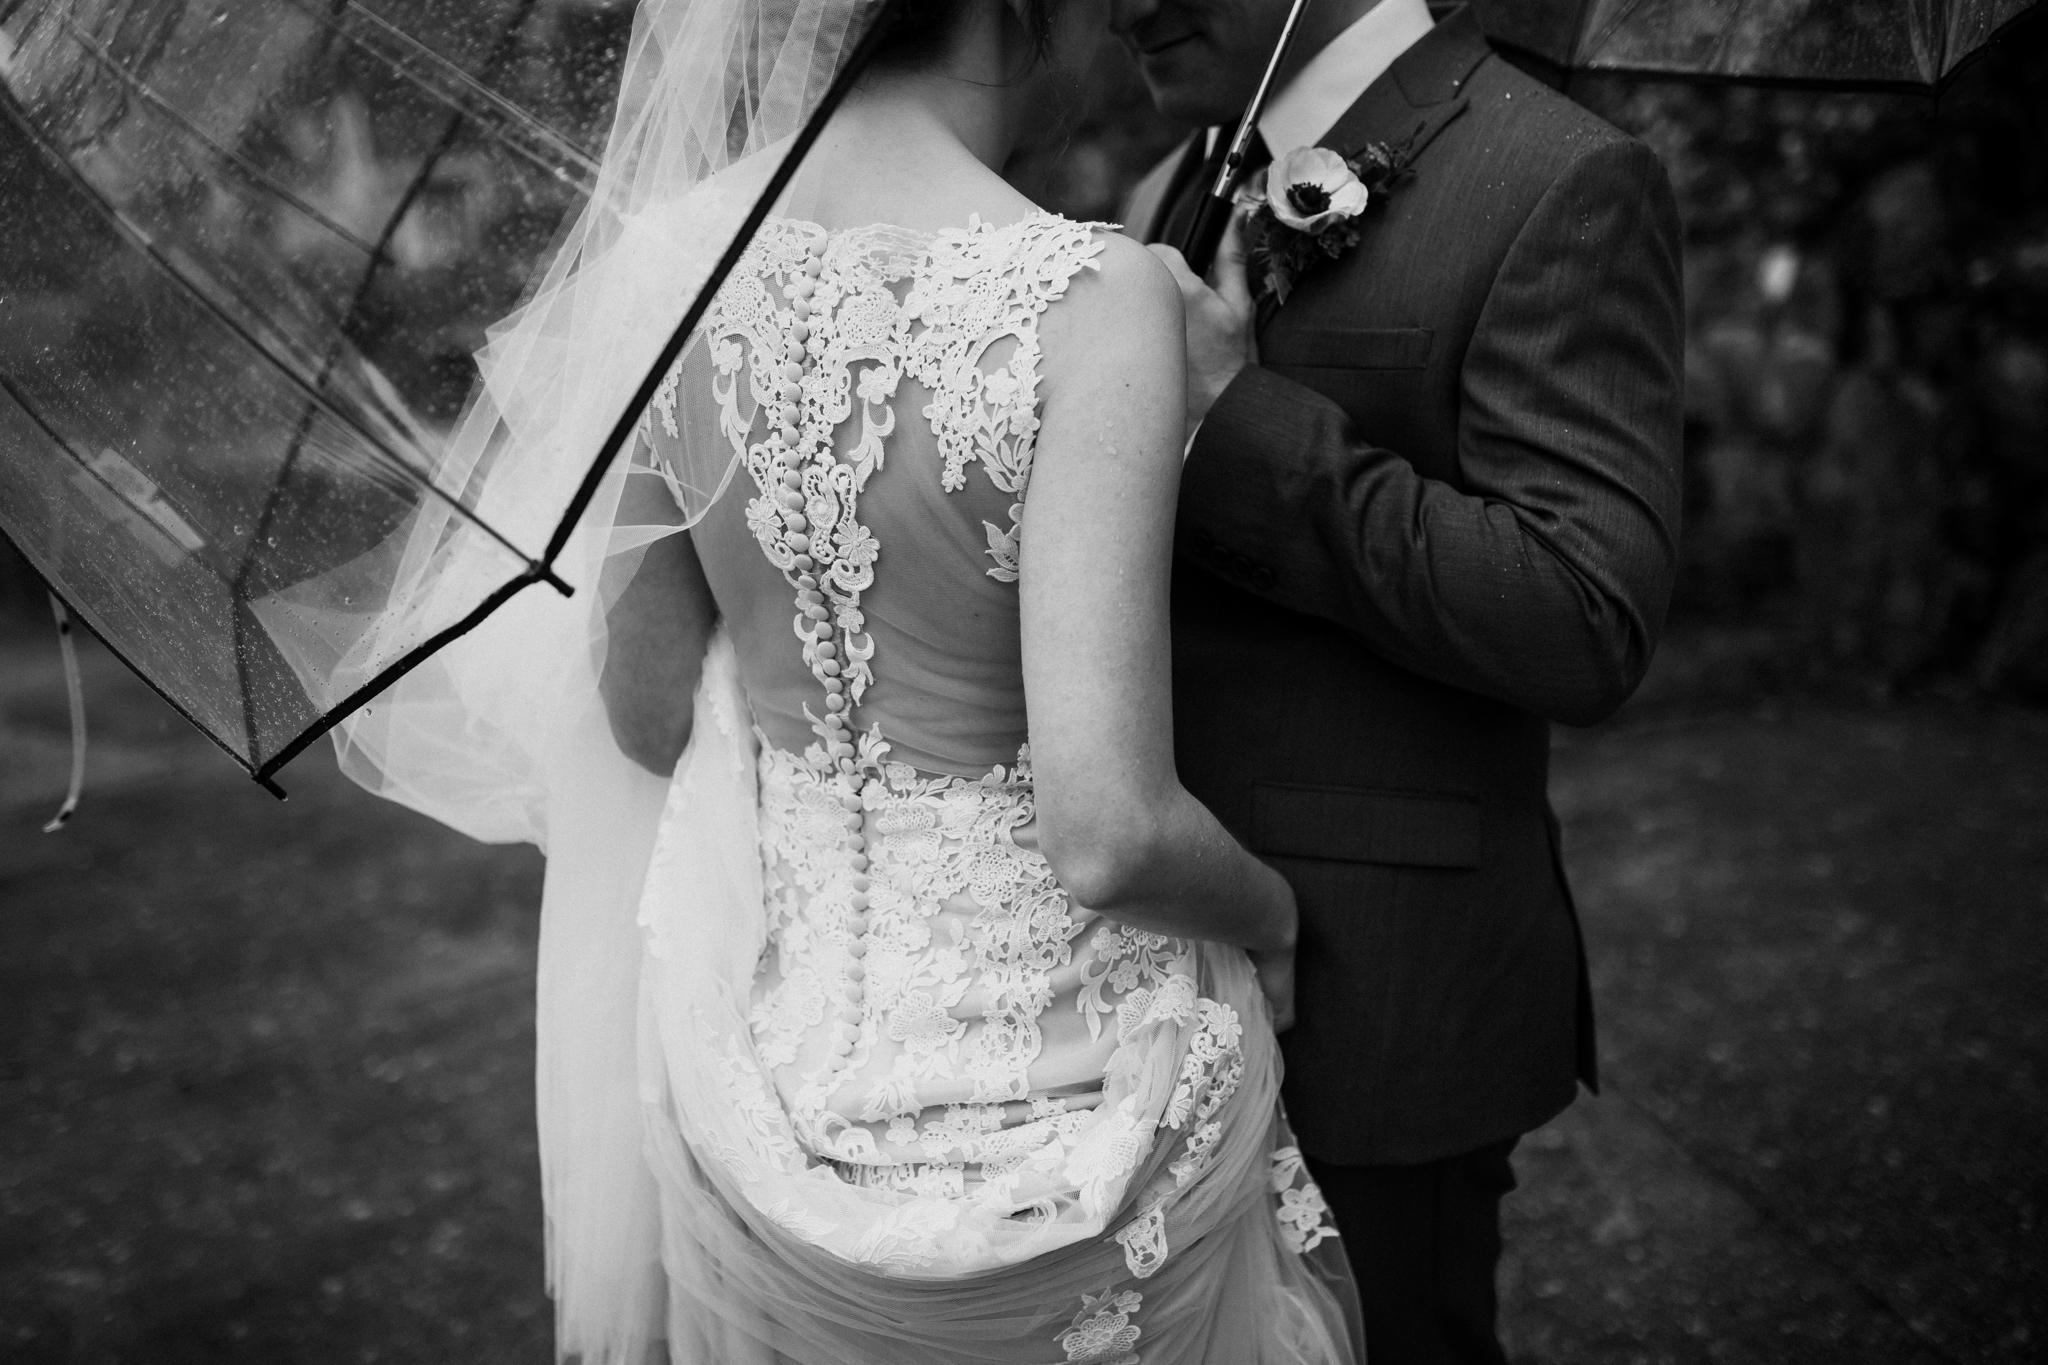 birmingham-alabama-wedding-photographer-laura-terry-the-warmth-around-you (62 of 110).jpg